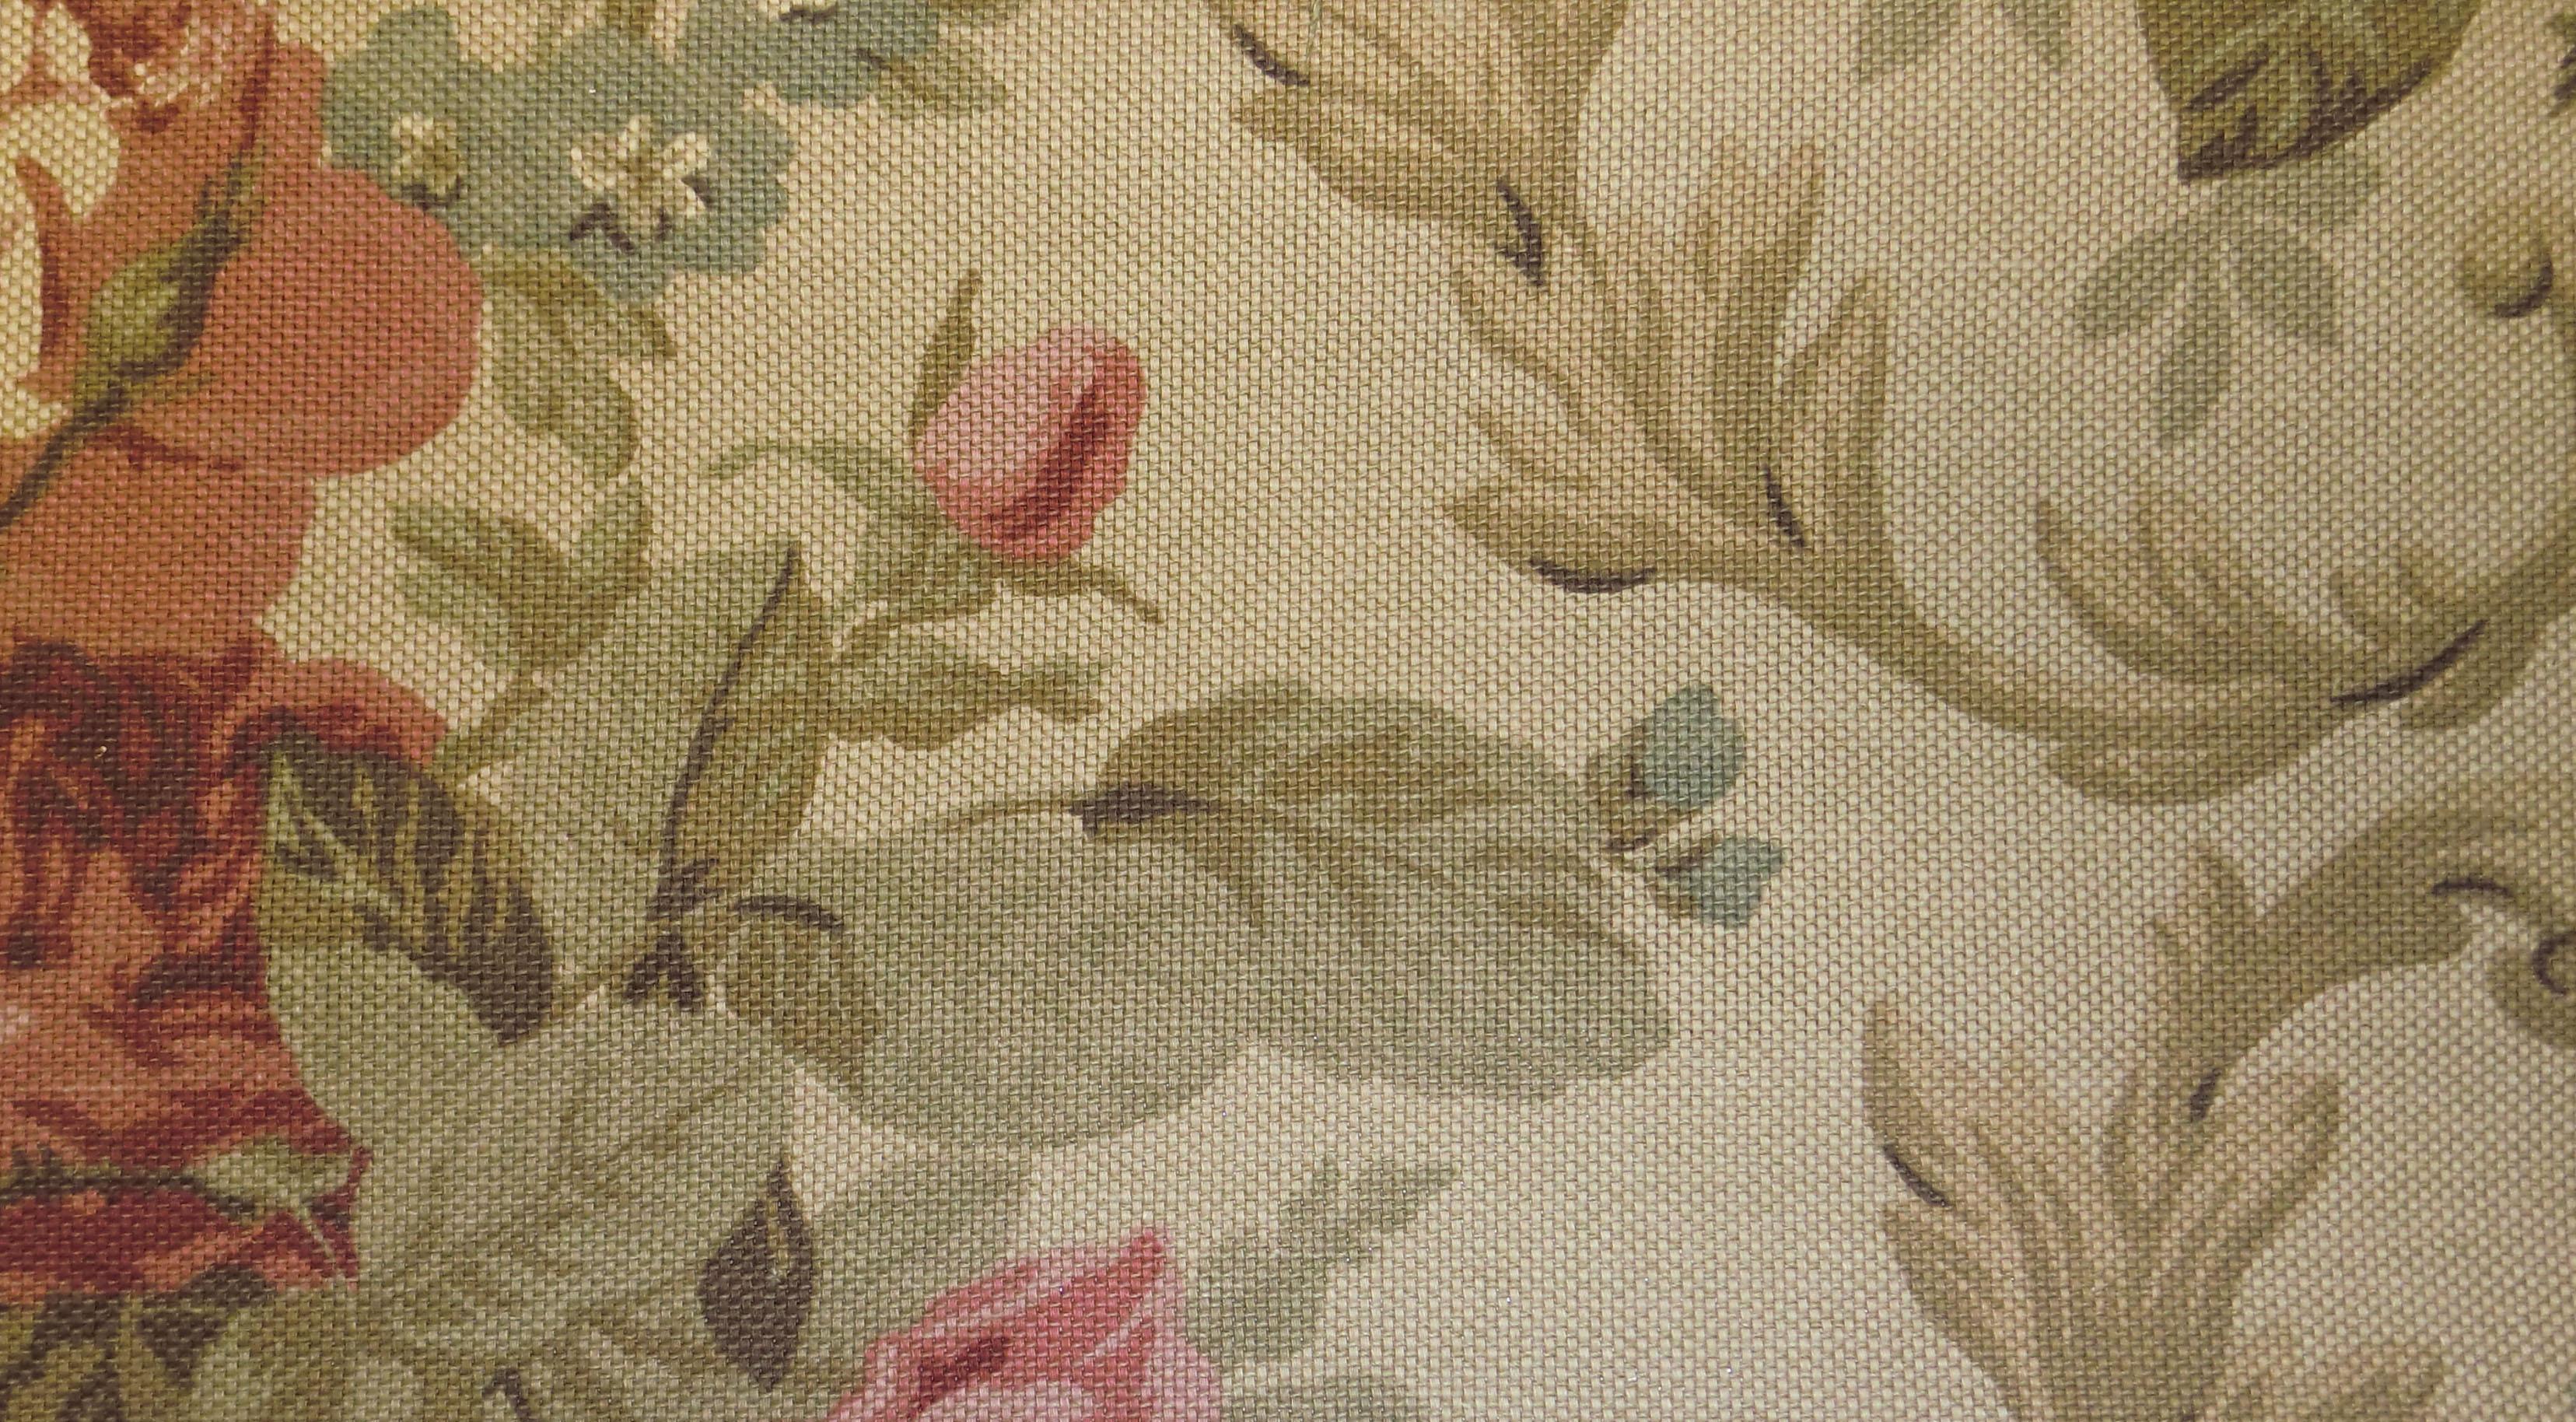 ralph lauren fabrics cottage rose tea rose interiordecorating com rh fabric textiles com ralph lauren cottage rose fabric black cottage rose fabric